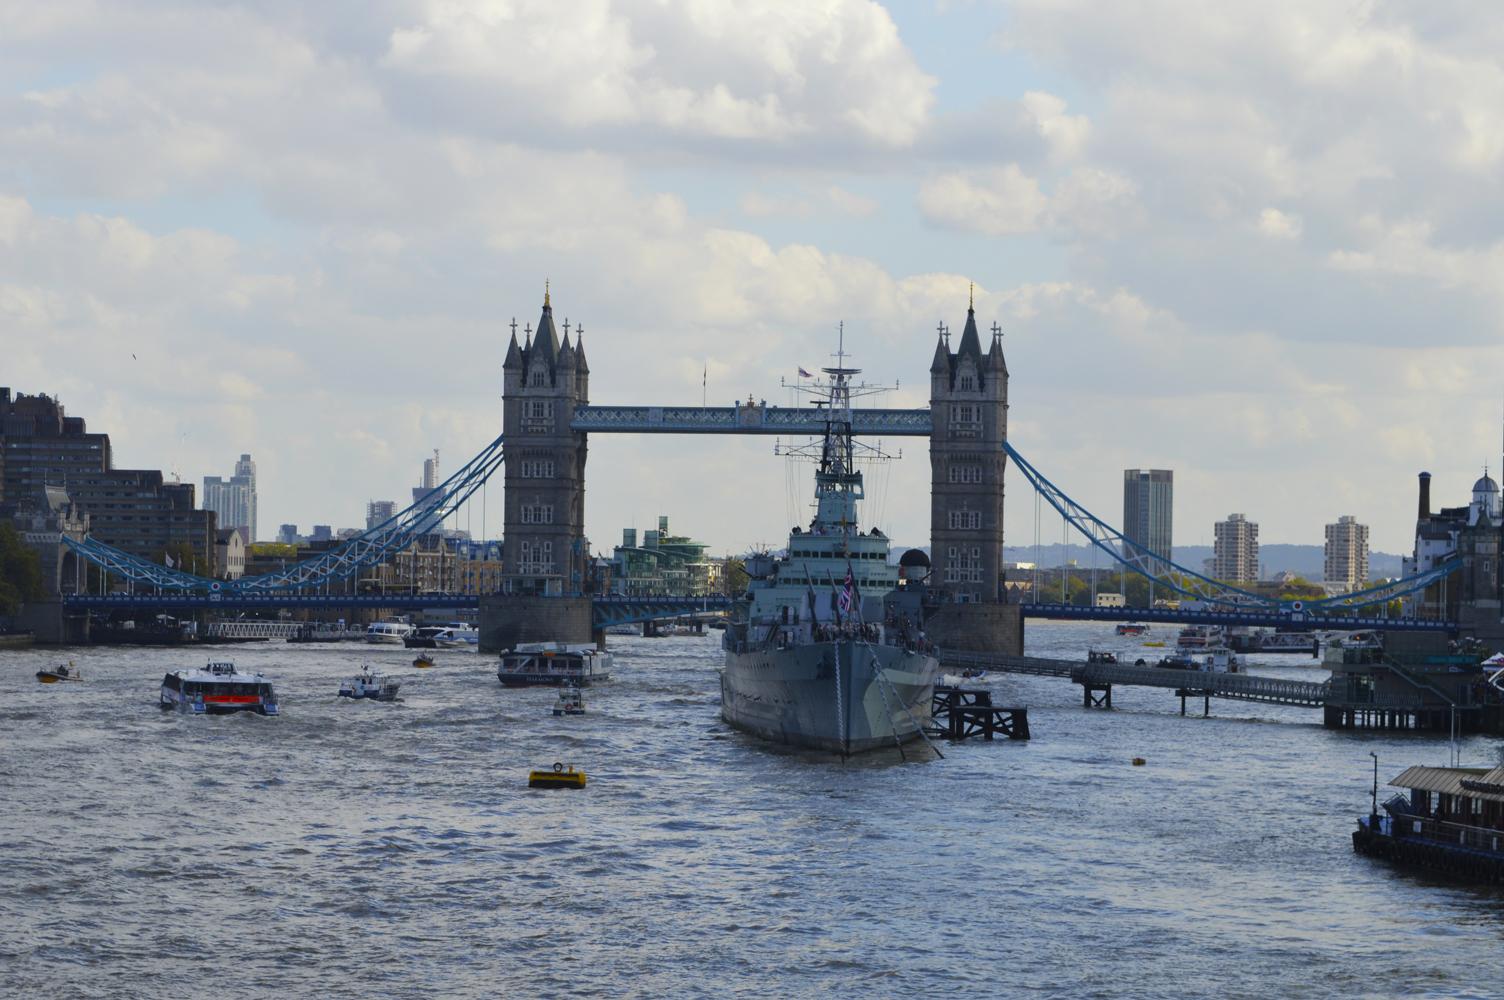 136 Tower Bridge. 26.09.2015